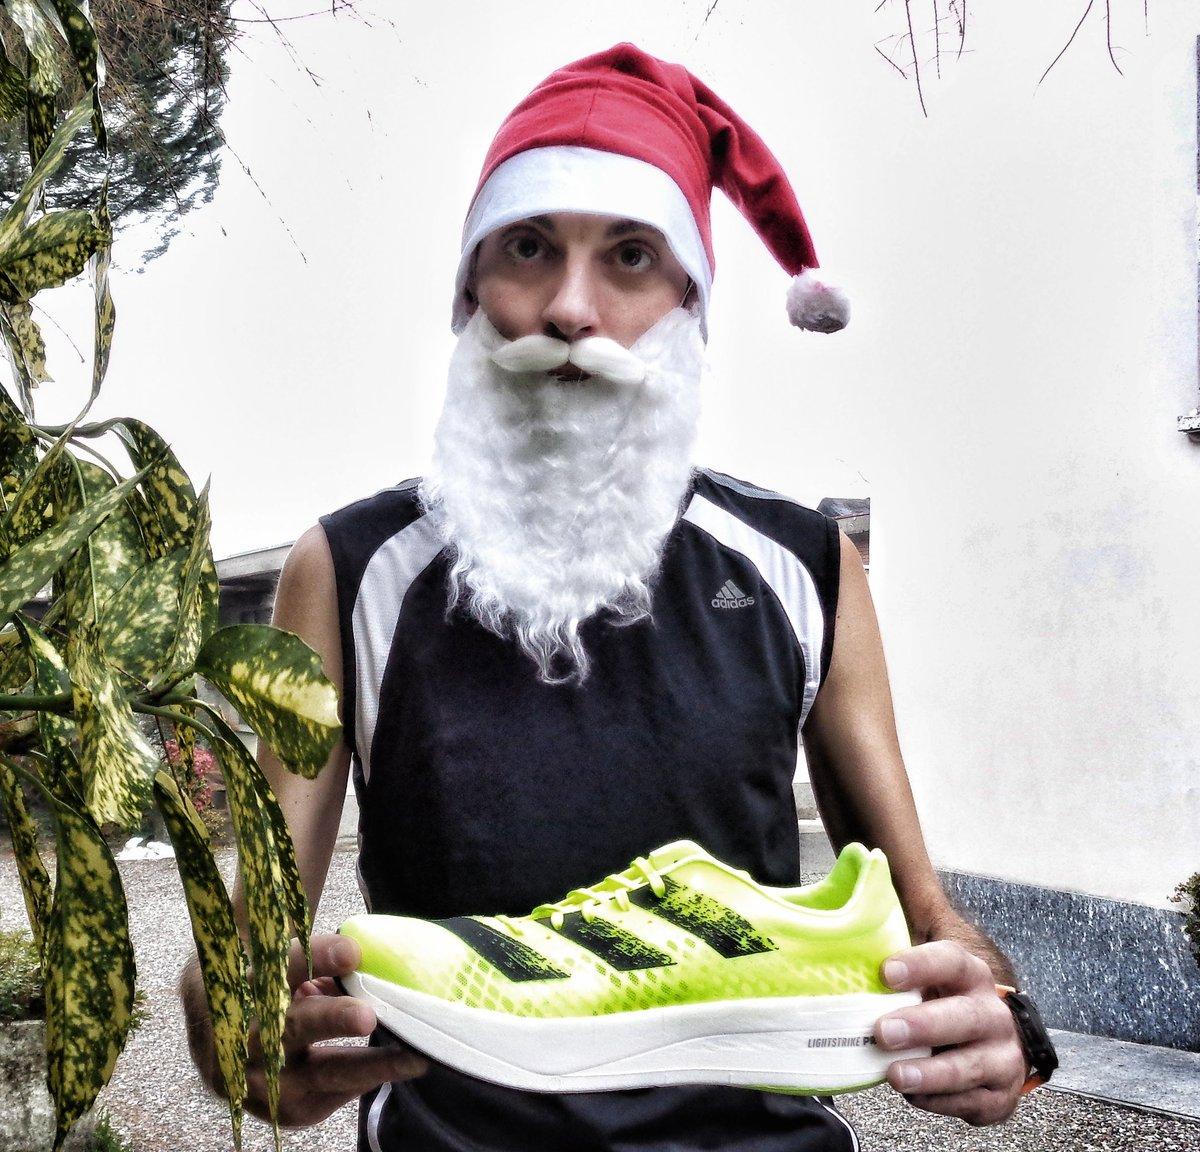 #adidas #adidasrunning #adizeroadiospro #Natale2020